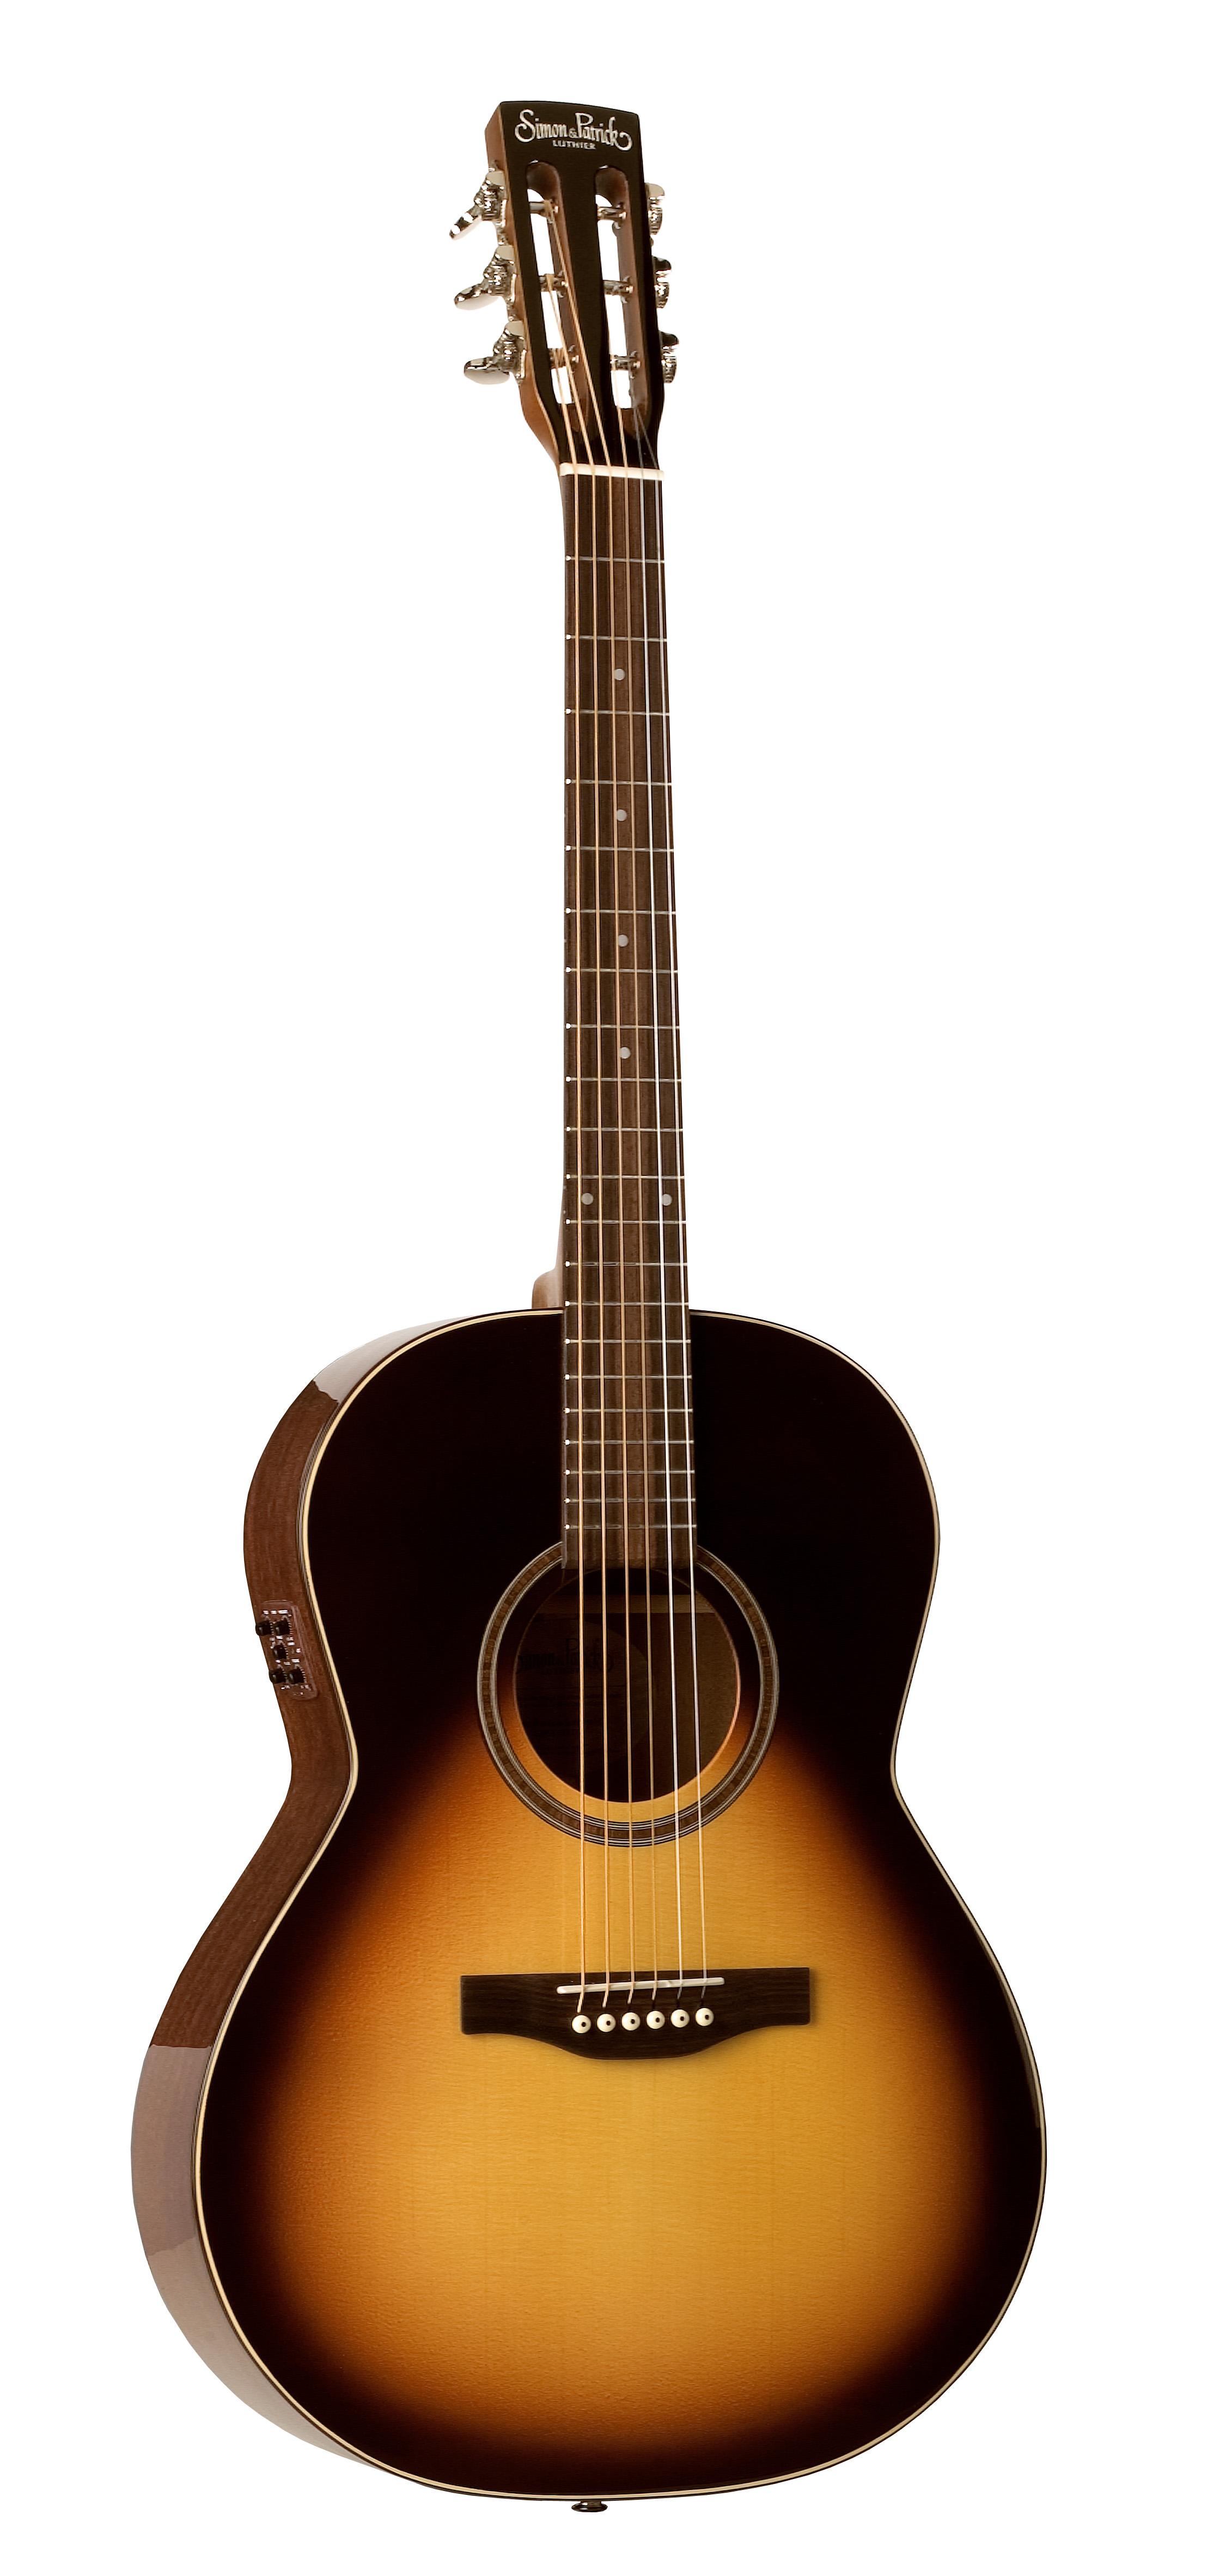 Simon & Patrick 38107 Woodland Pro Folk Sunburst Acoustic Electric Guitar w/ B-Band A3T